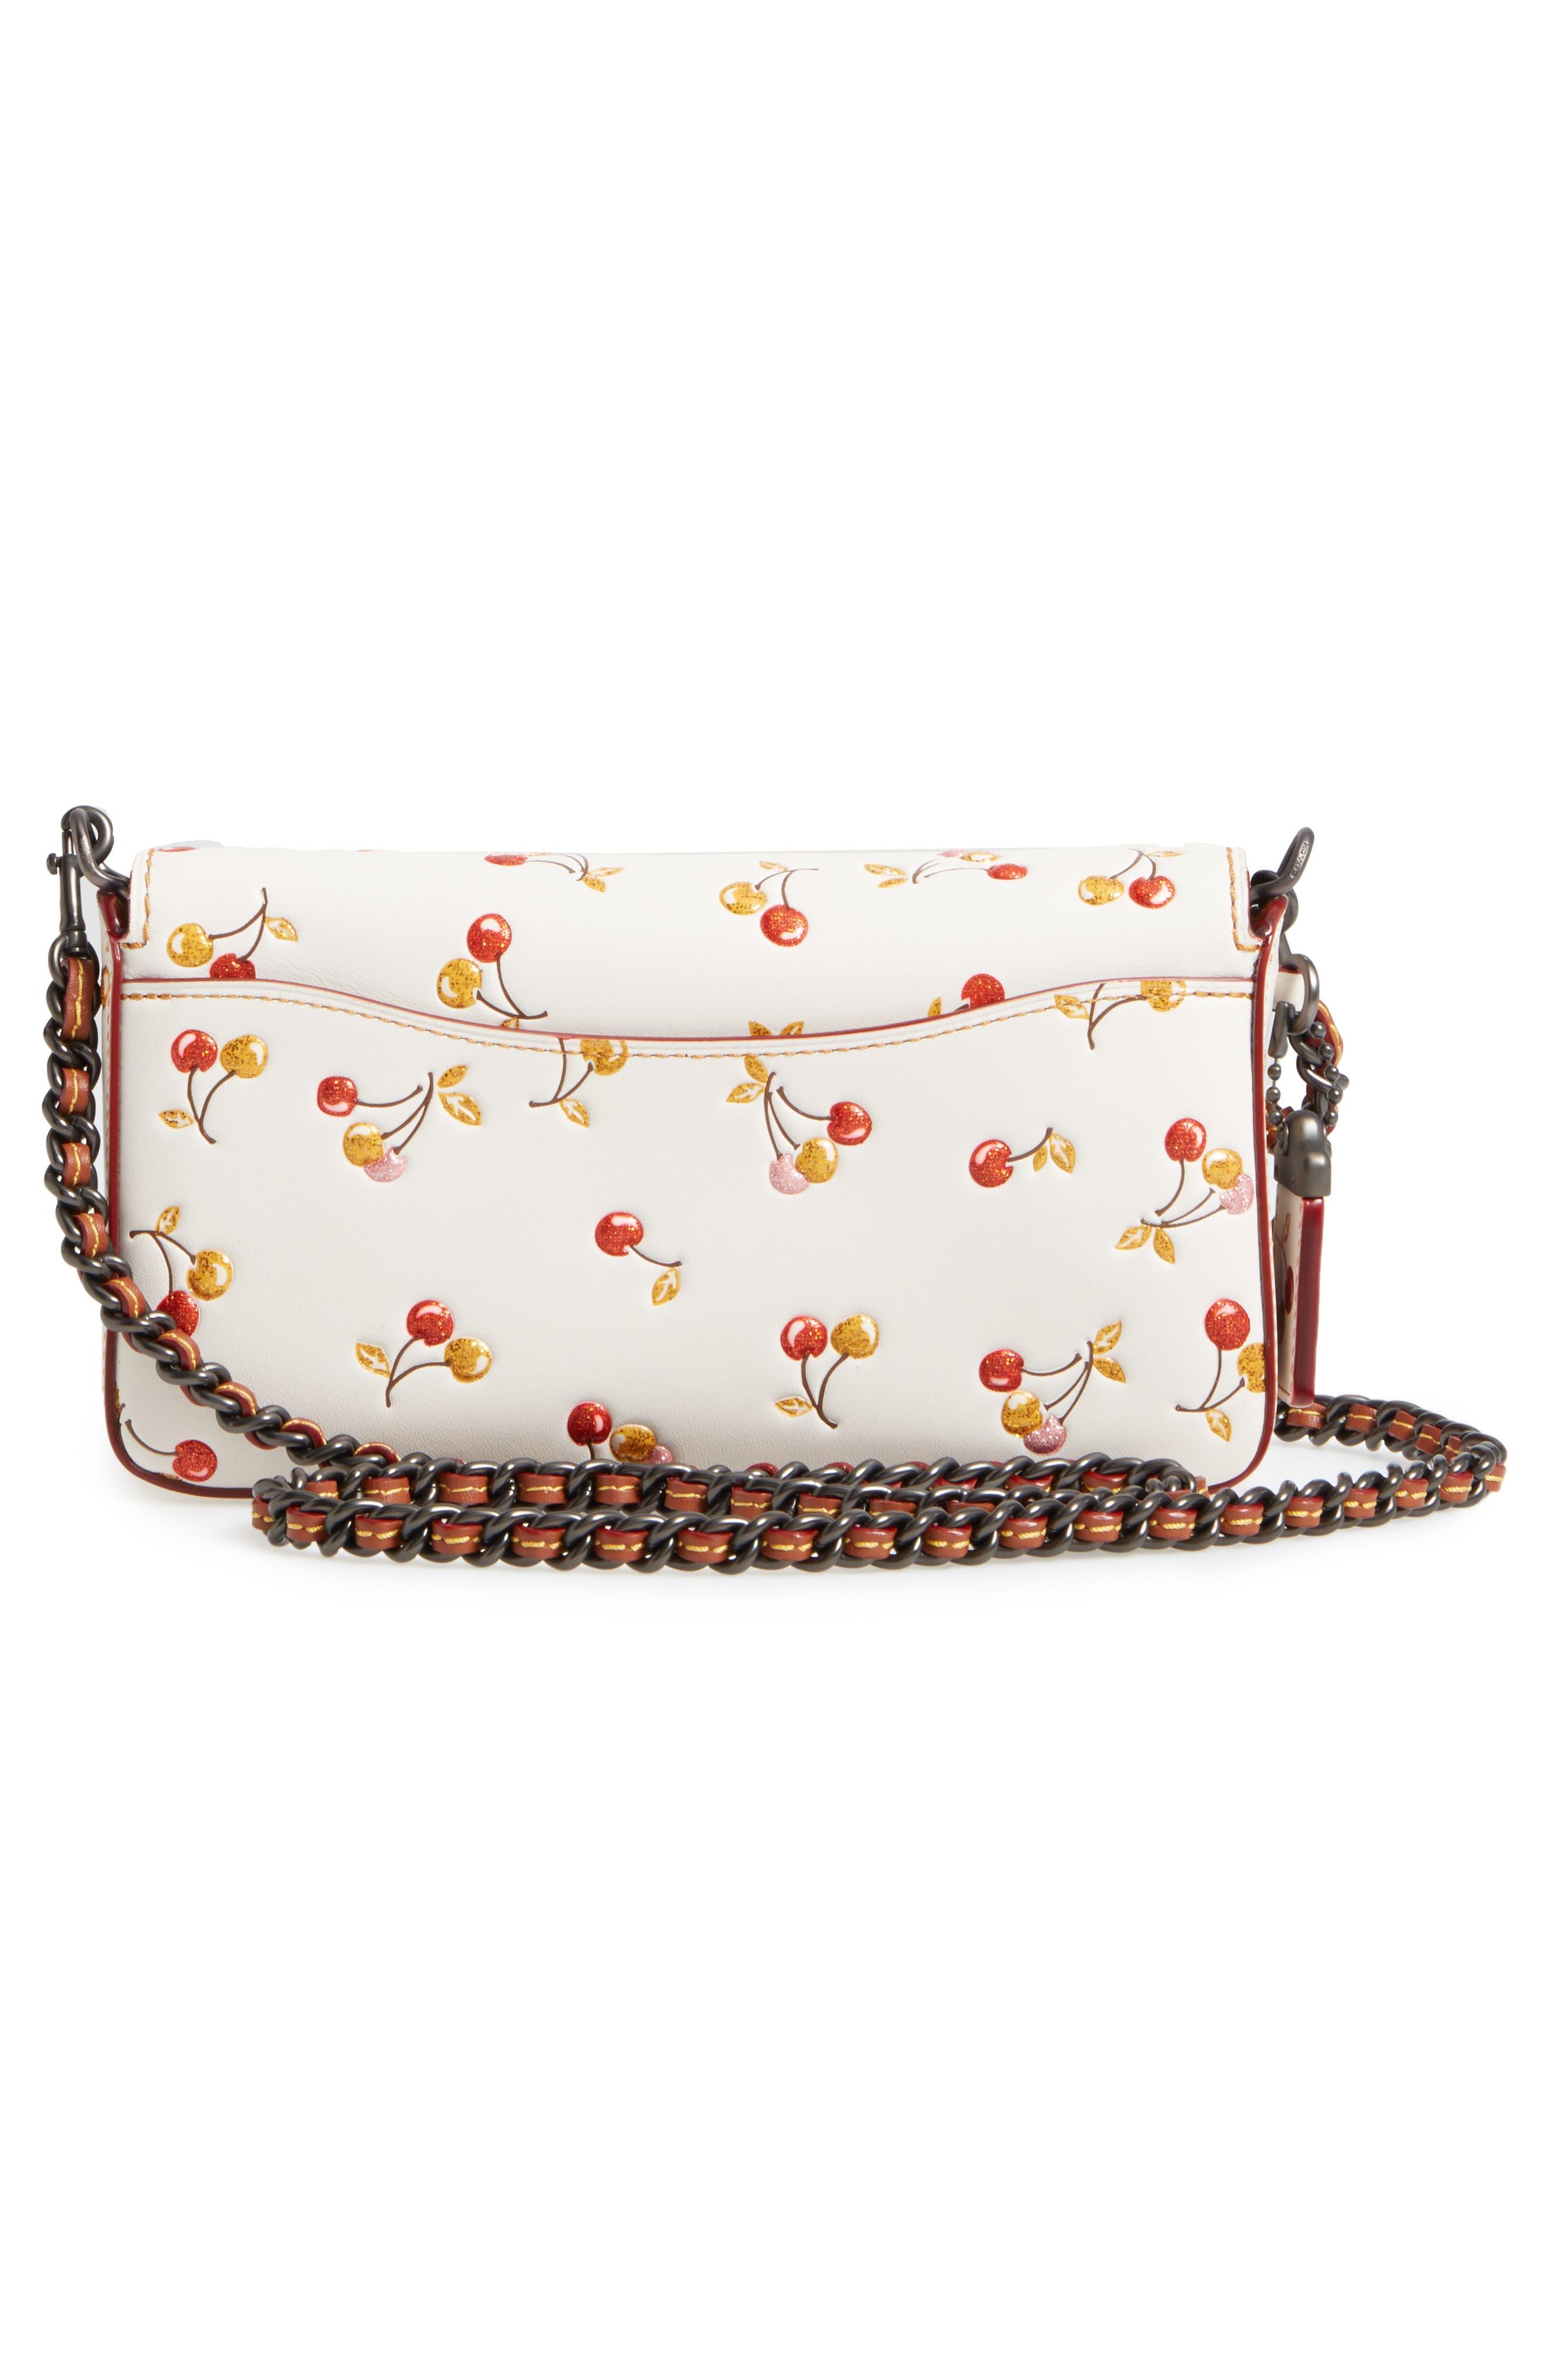 Alternate Image 3  - COACH 1941 Cherries Dinky Leather Crossbody Bag